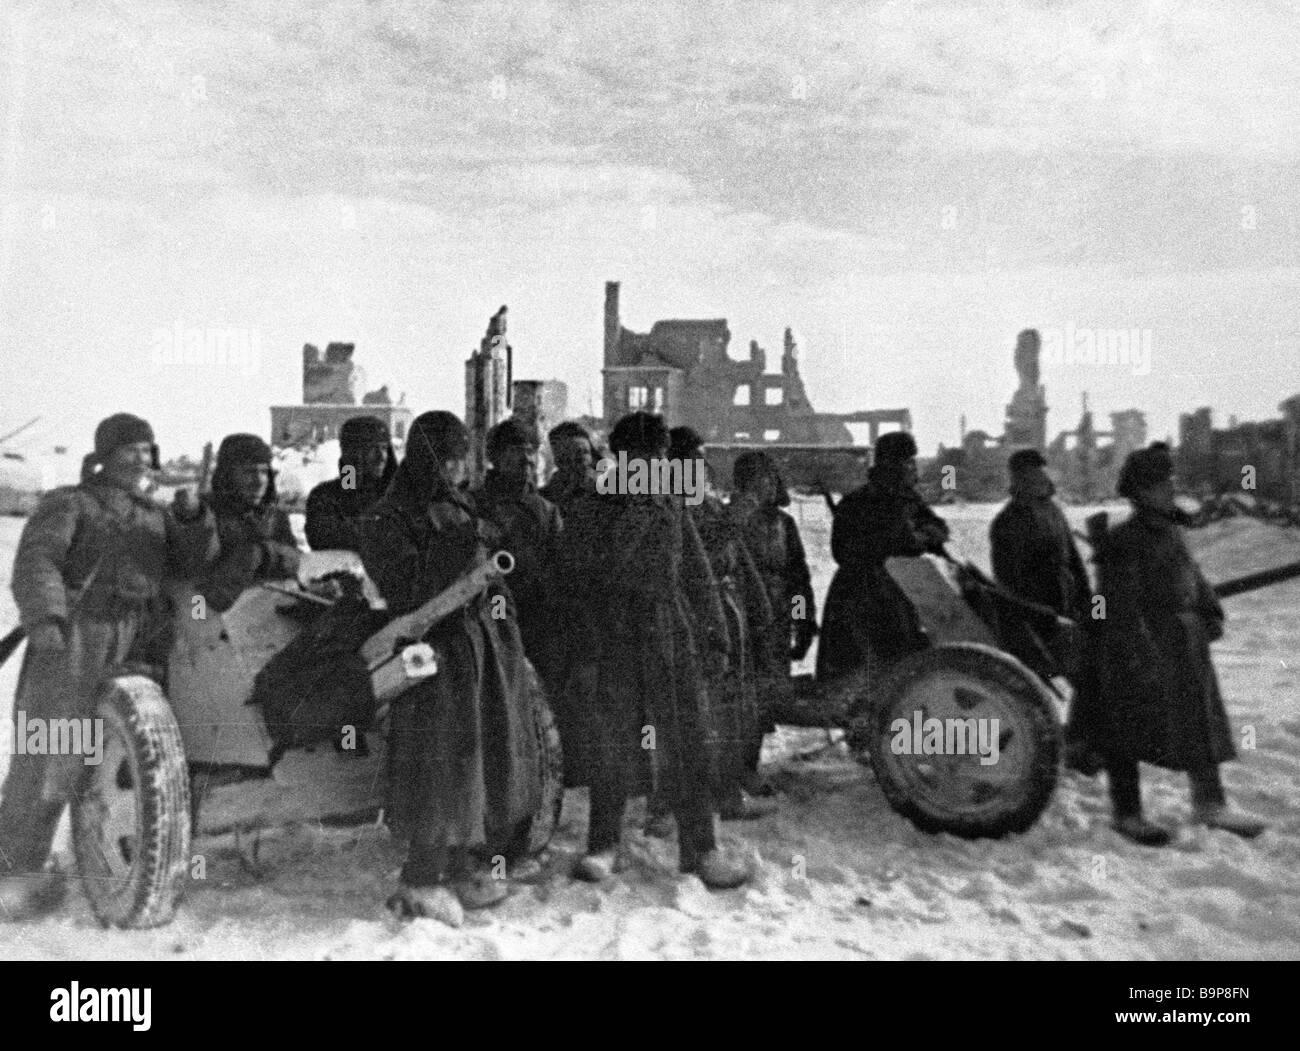 Artillery men in Stalingrad - Stock Image